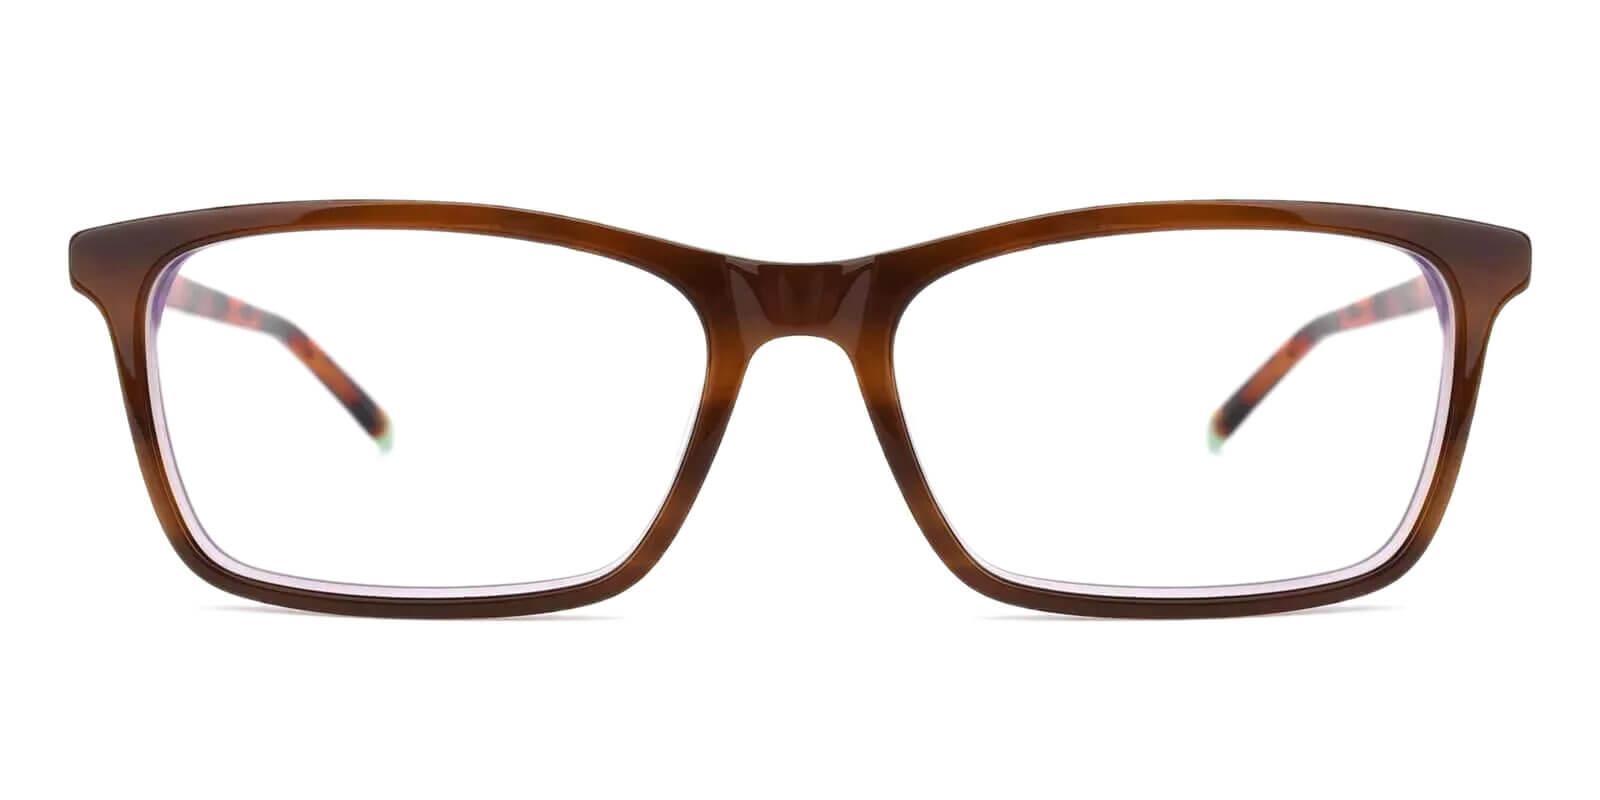 Quasqueton Tortoise Acetate Eyeglasses , SpringHinges , UniversalBridgeFit Frames from ABBE Glasses